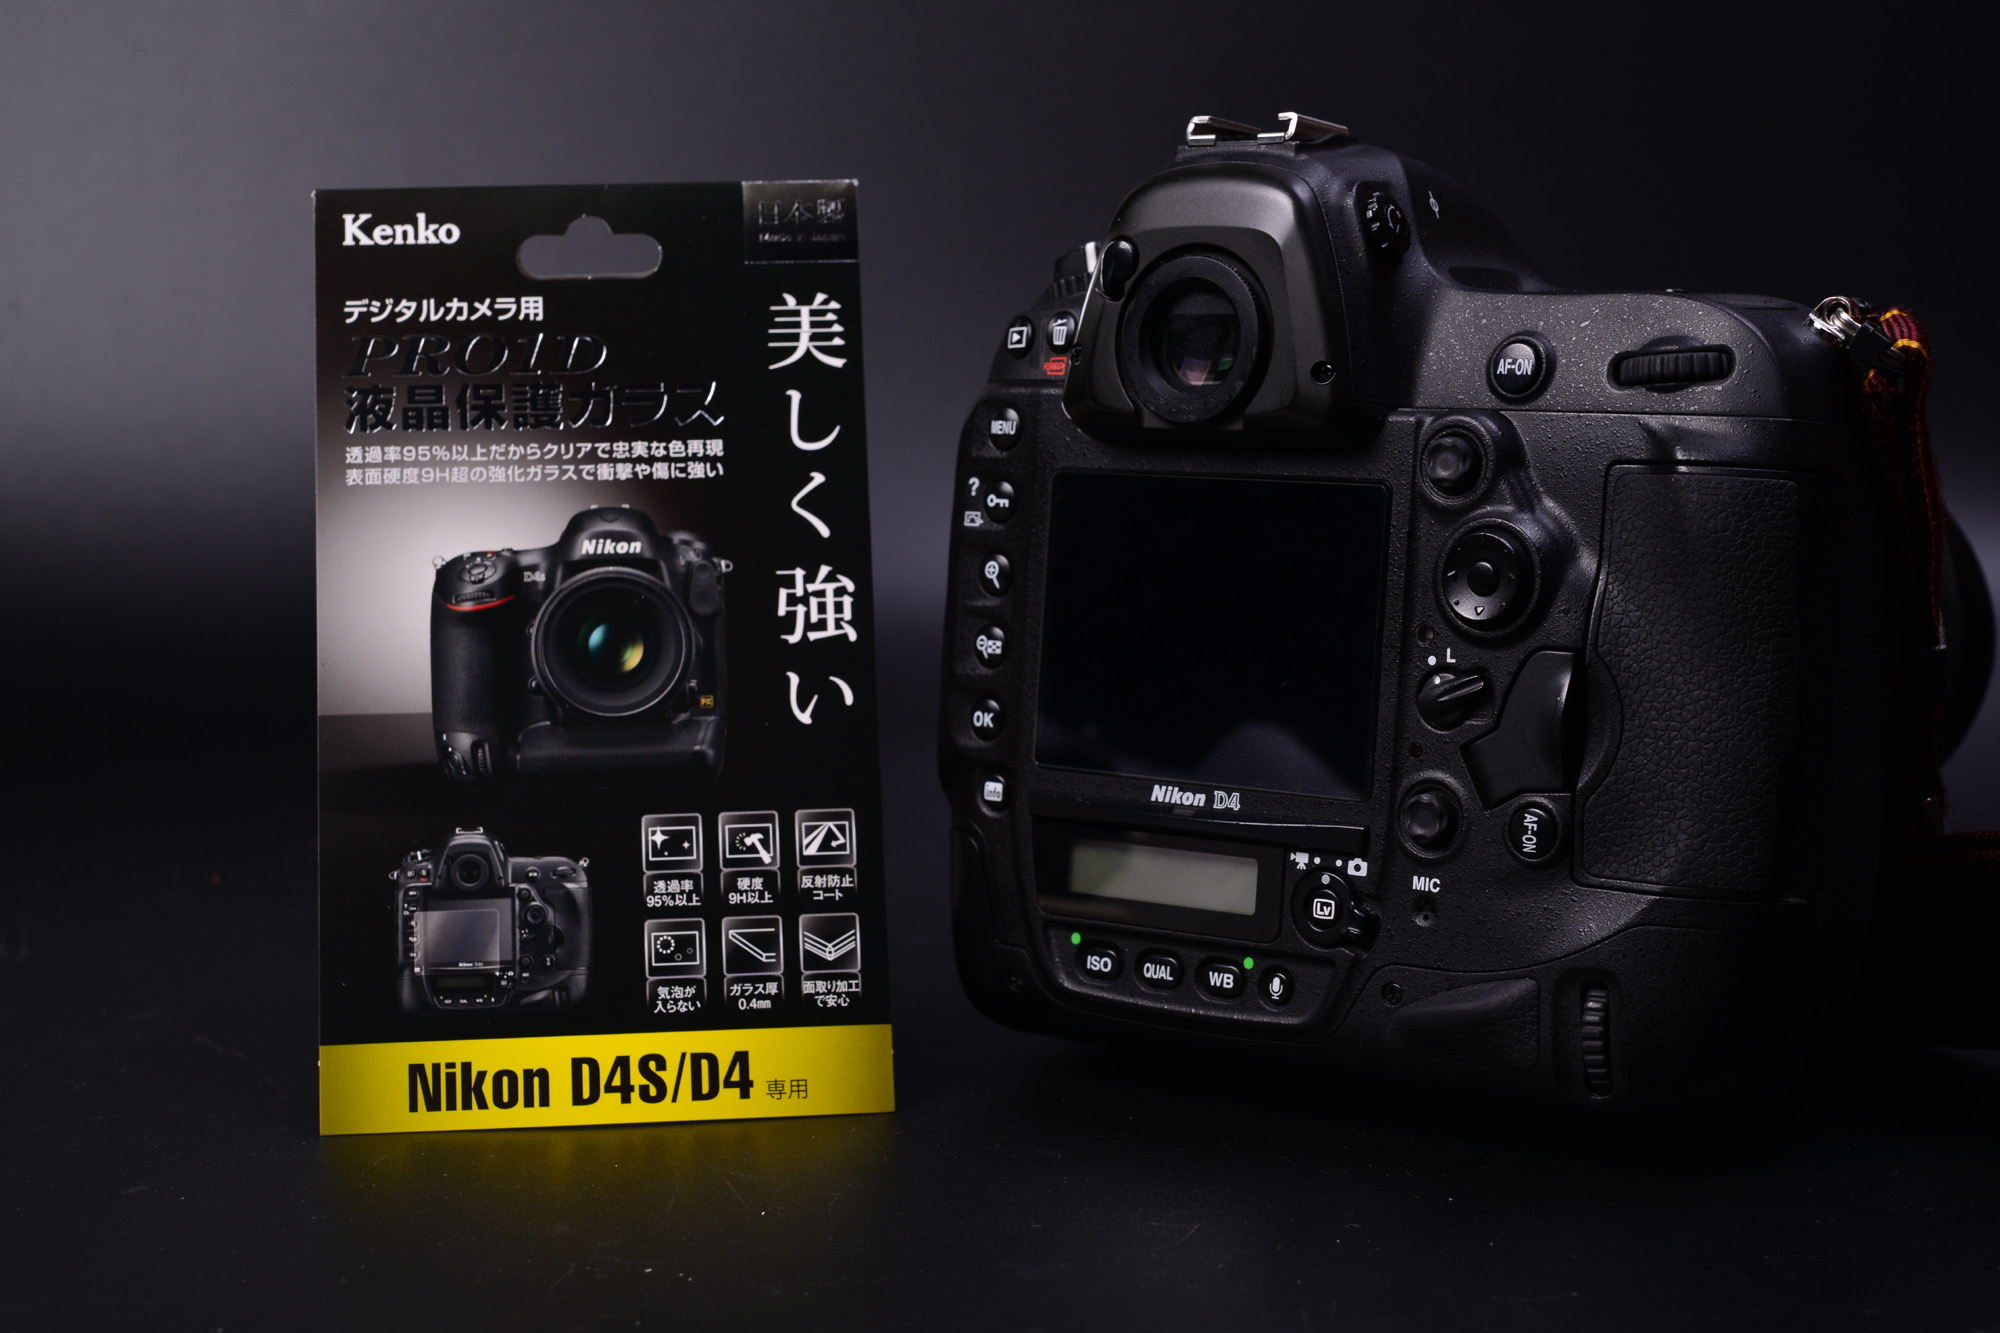 kenko ケンコー PRO1D液晶保護ガラス Nikon D4 D800 購入 レビュー